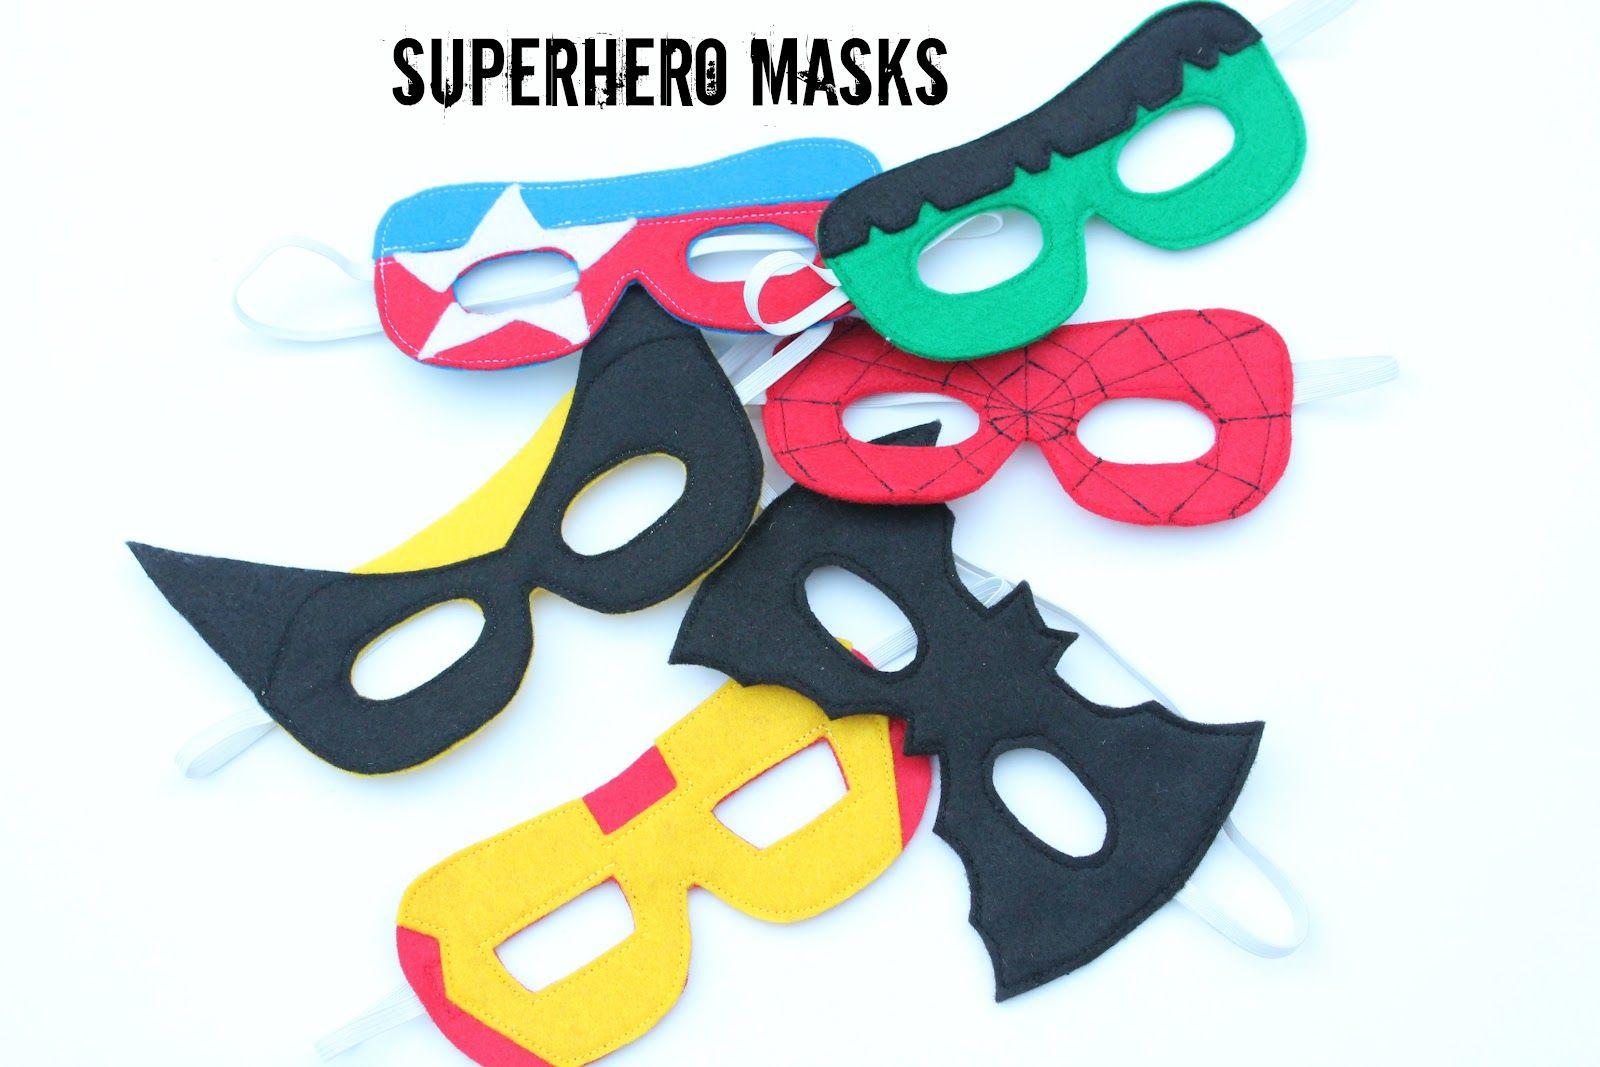 Superhero Masks With Images